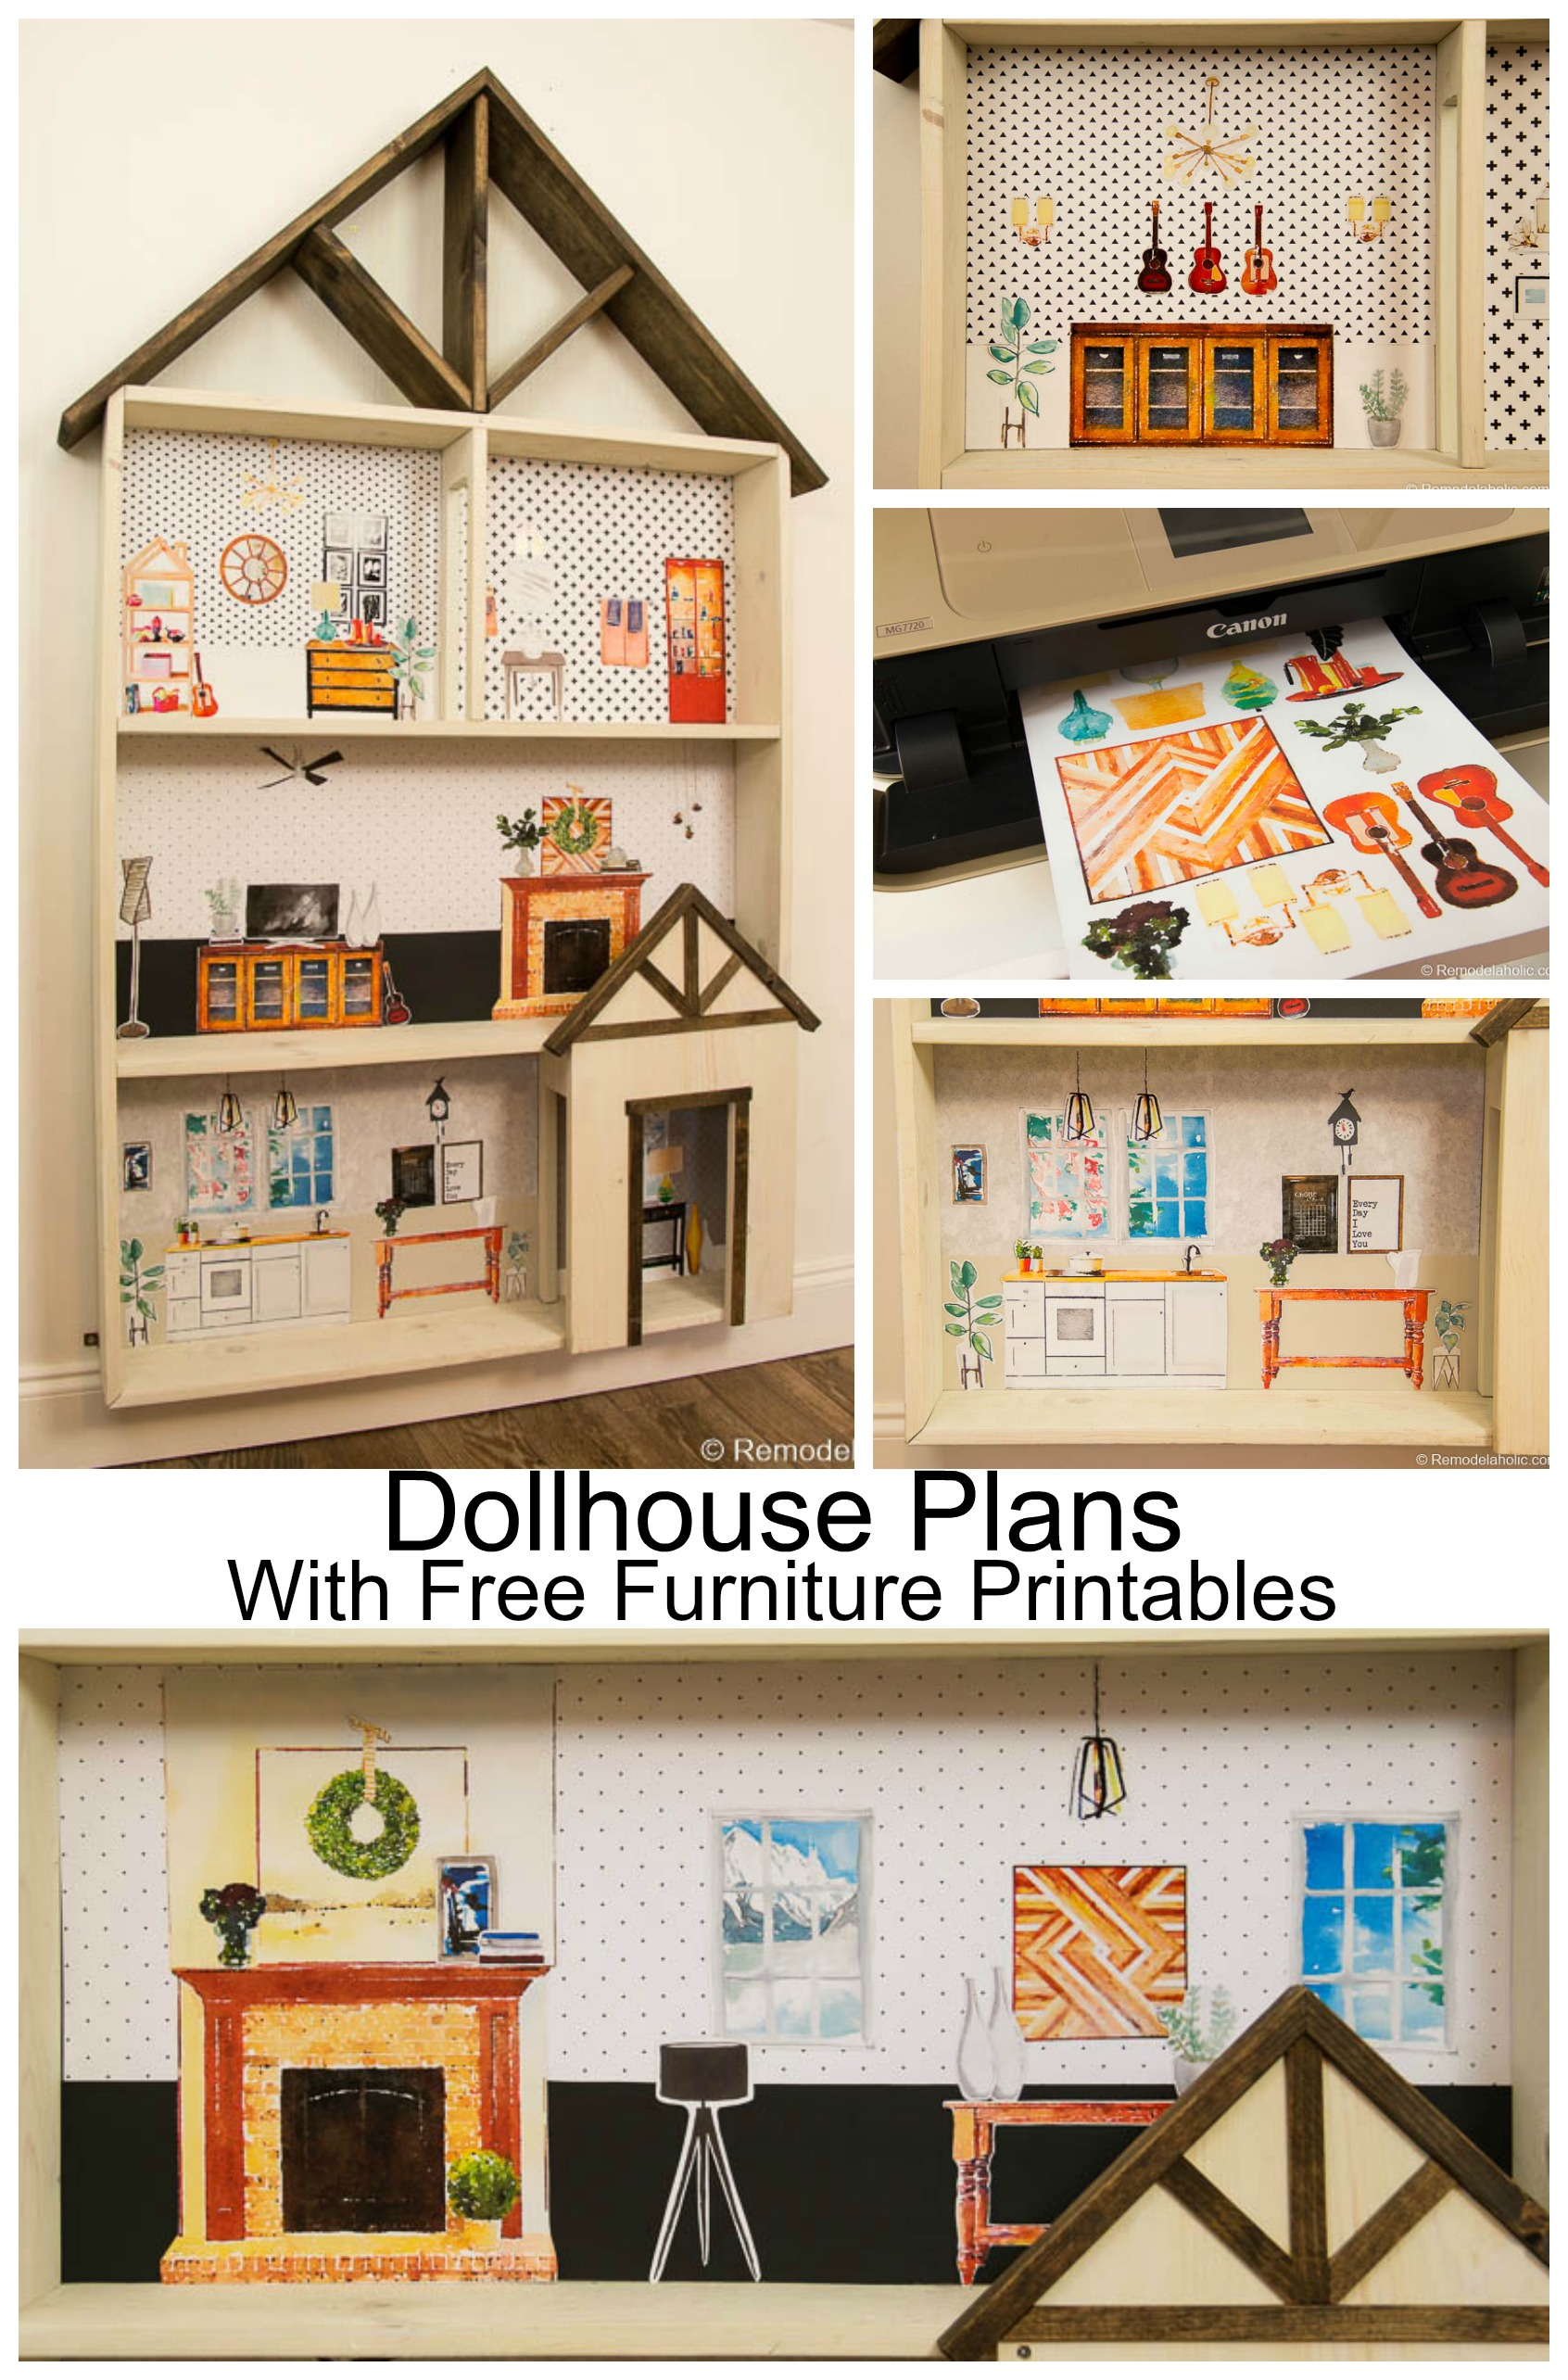 Free Printable Dollhouse Bathroom News Wilkinskennedy Com